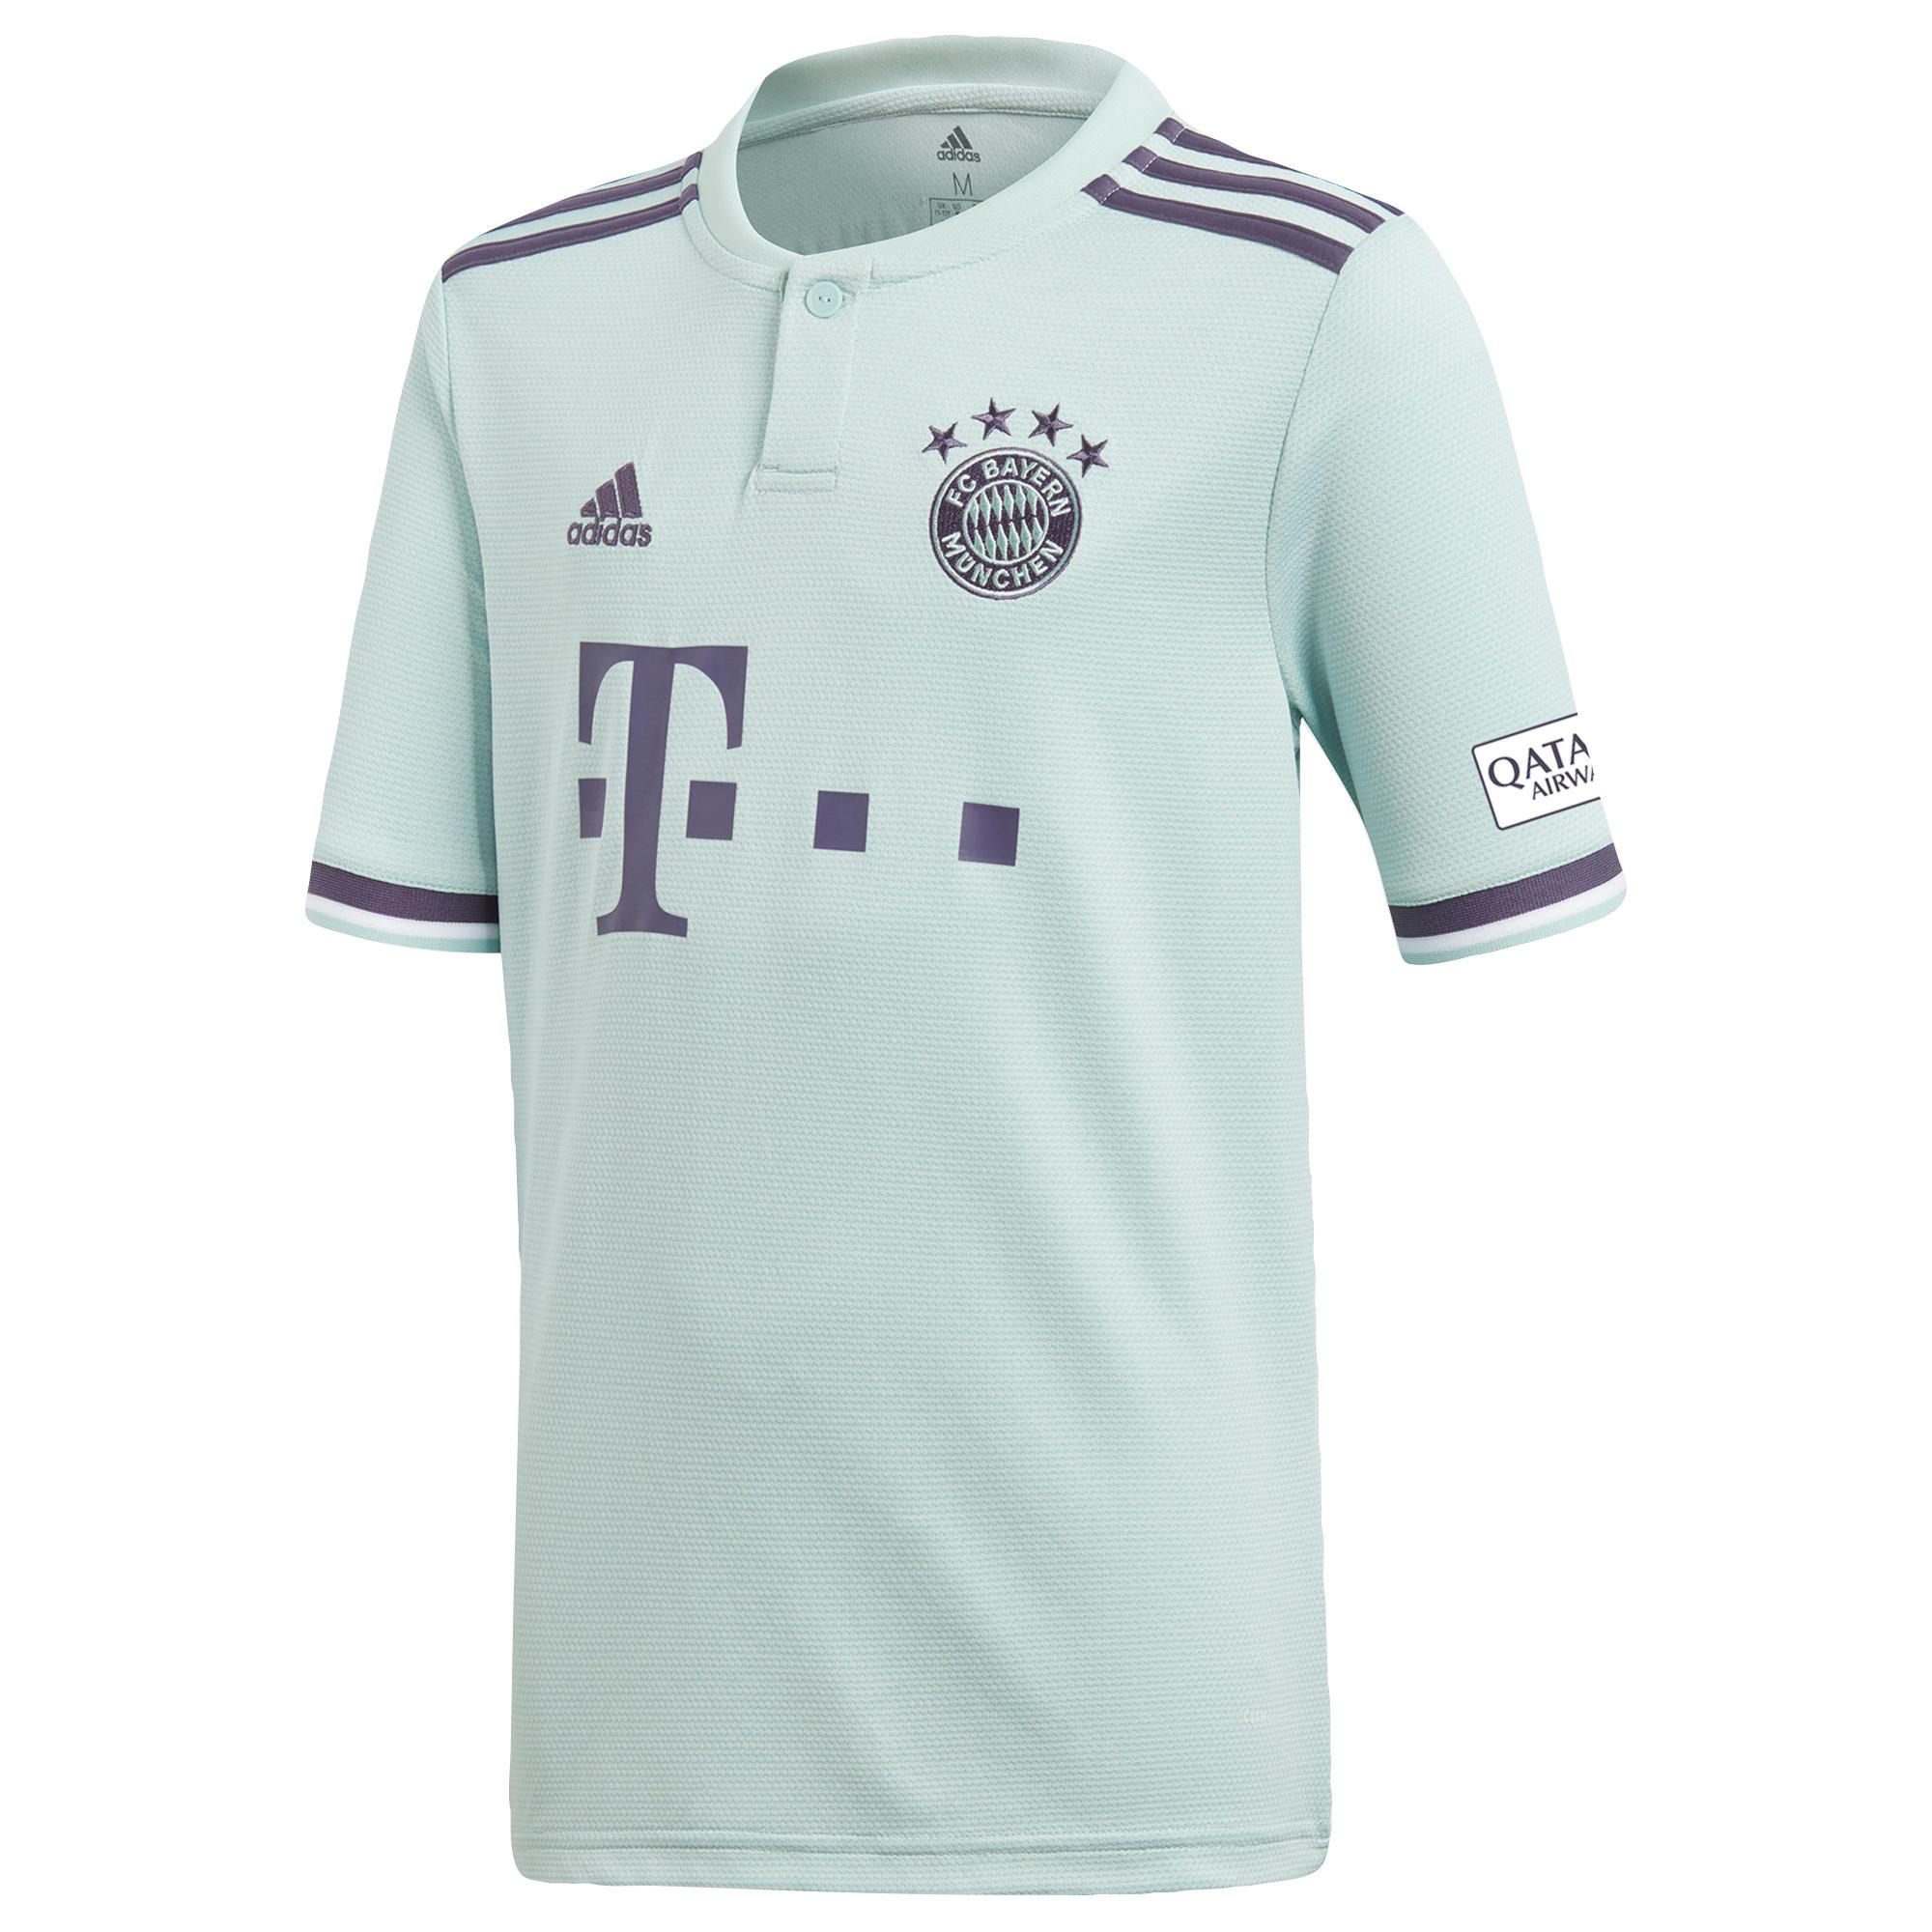 Fußballtrikot Bayern München Erwachsene   Sportbekleidung > Trikots > Fußballtrikots   Adidas